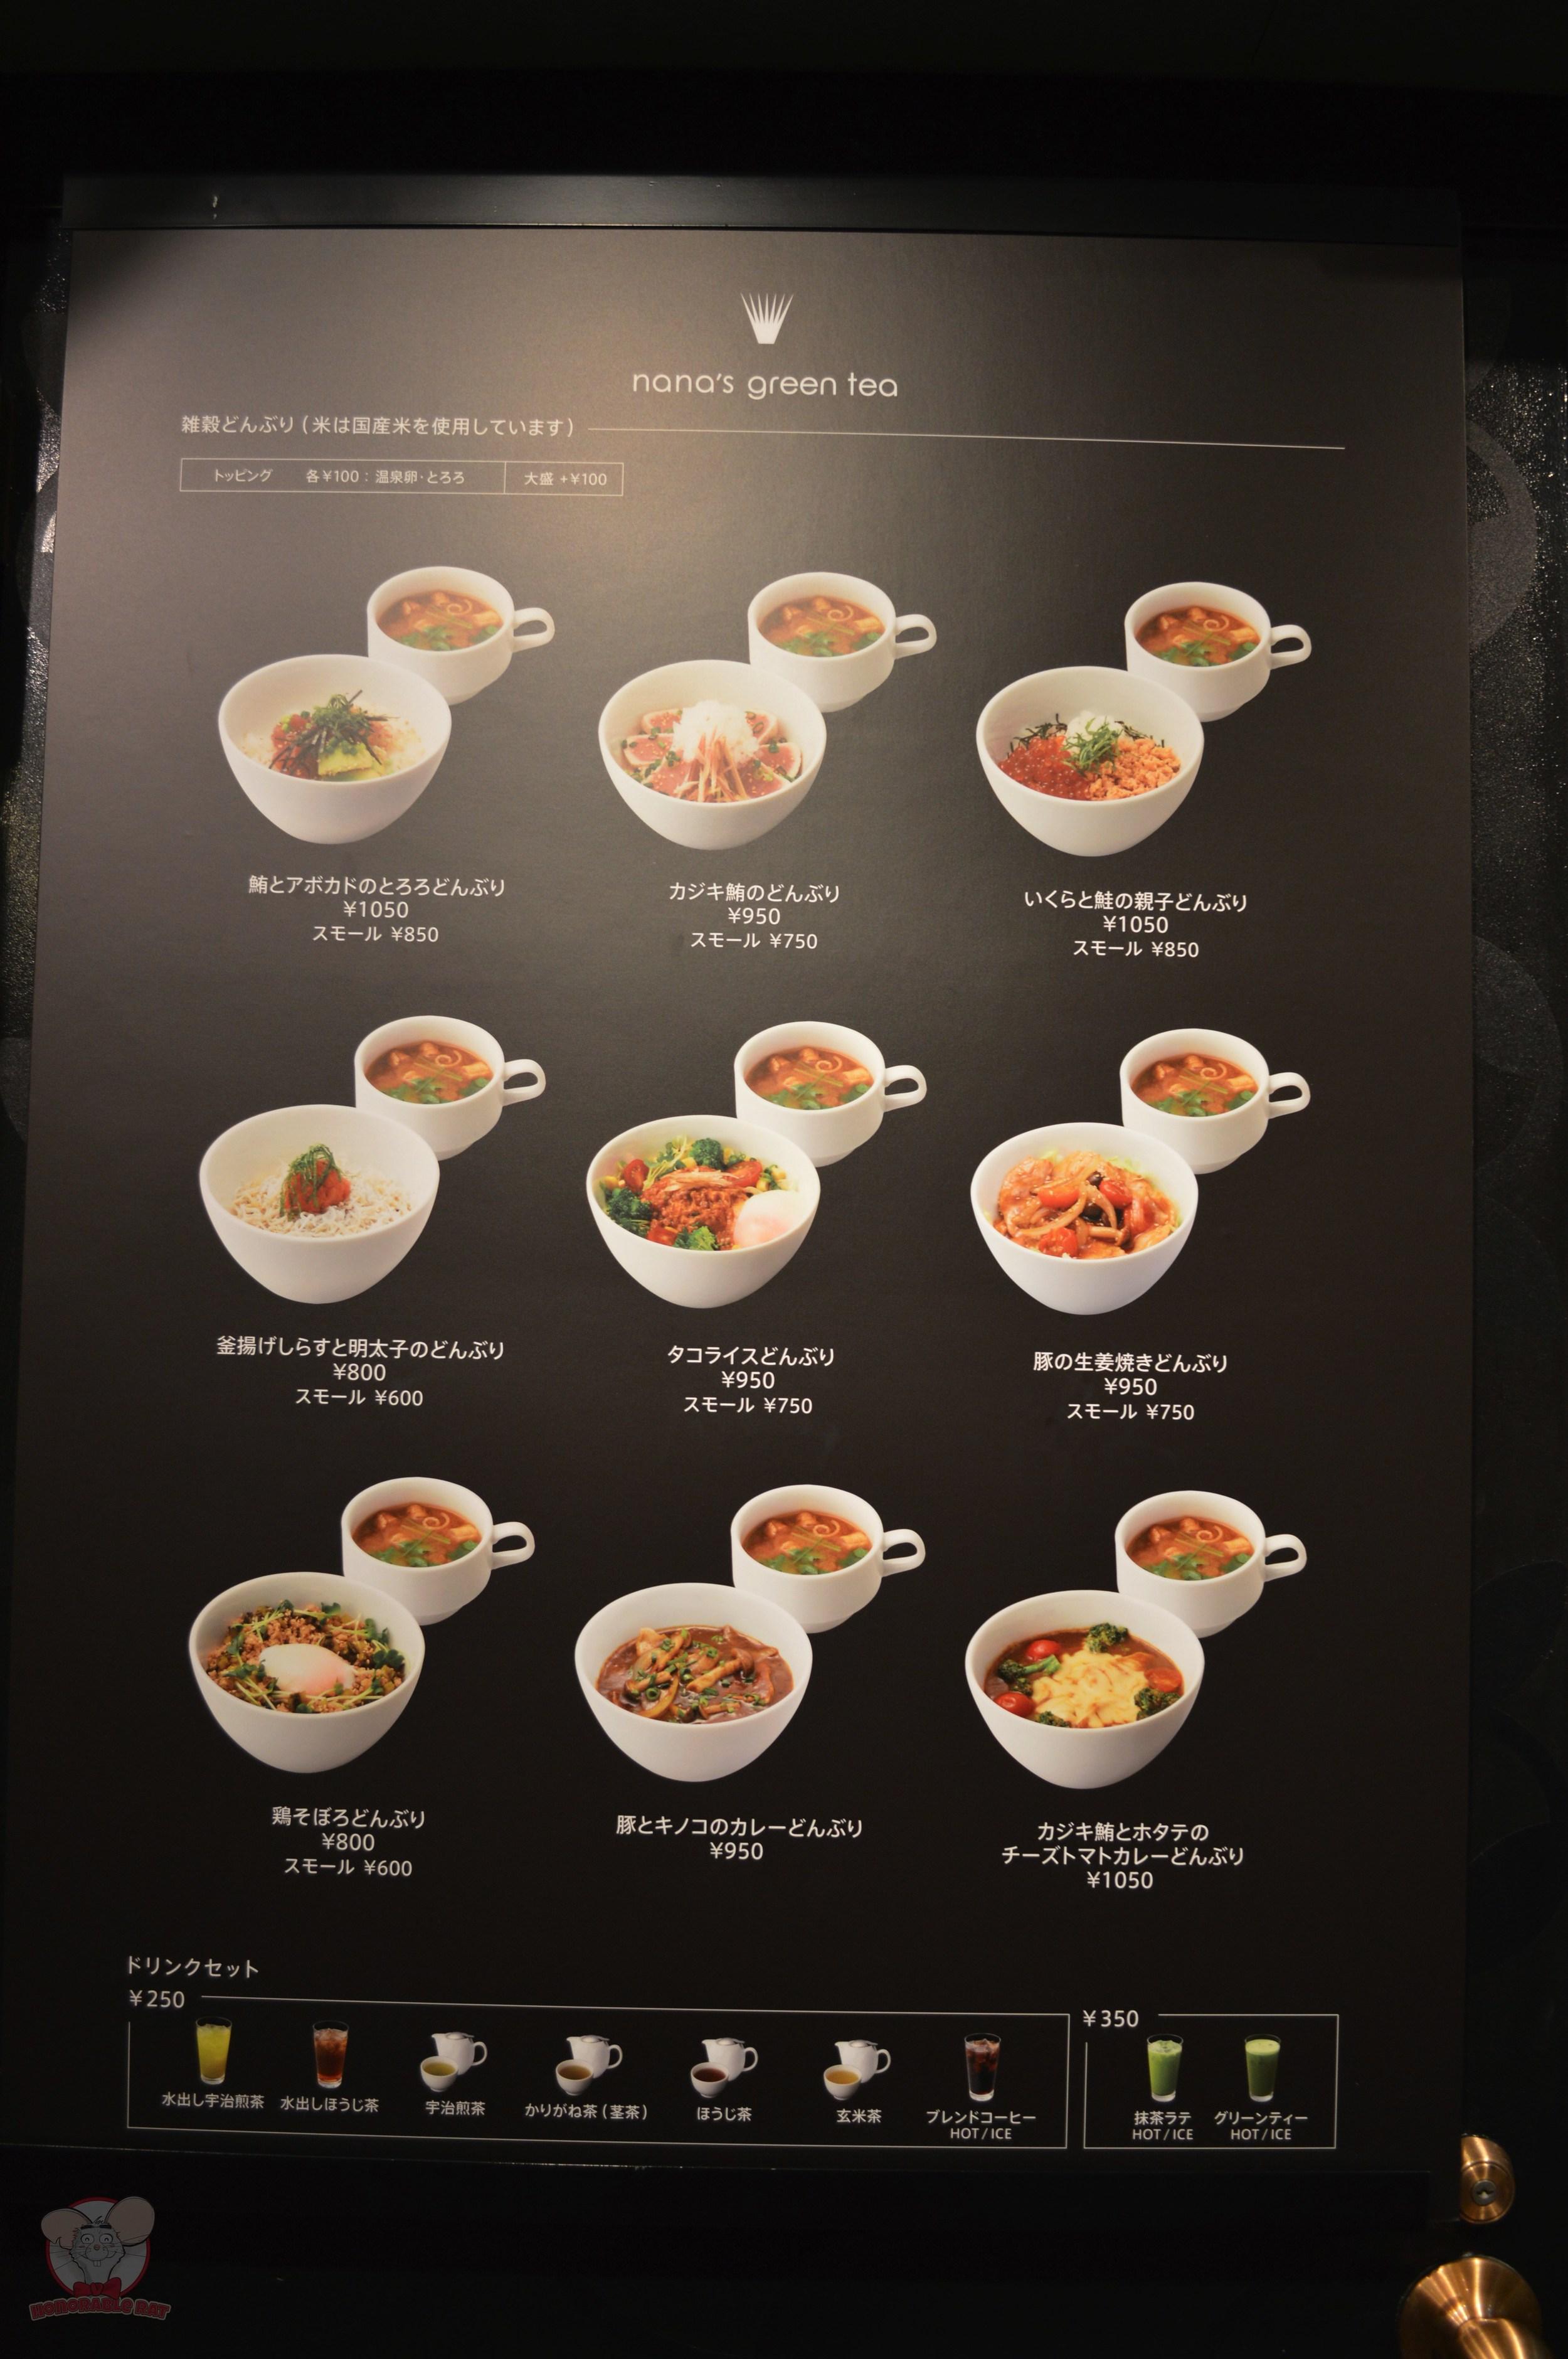 Nana's Green Tea Food Menu